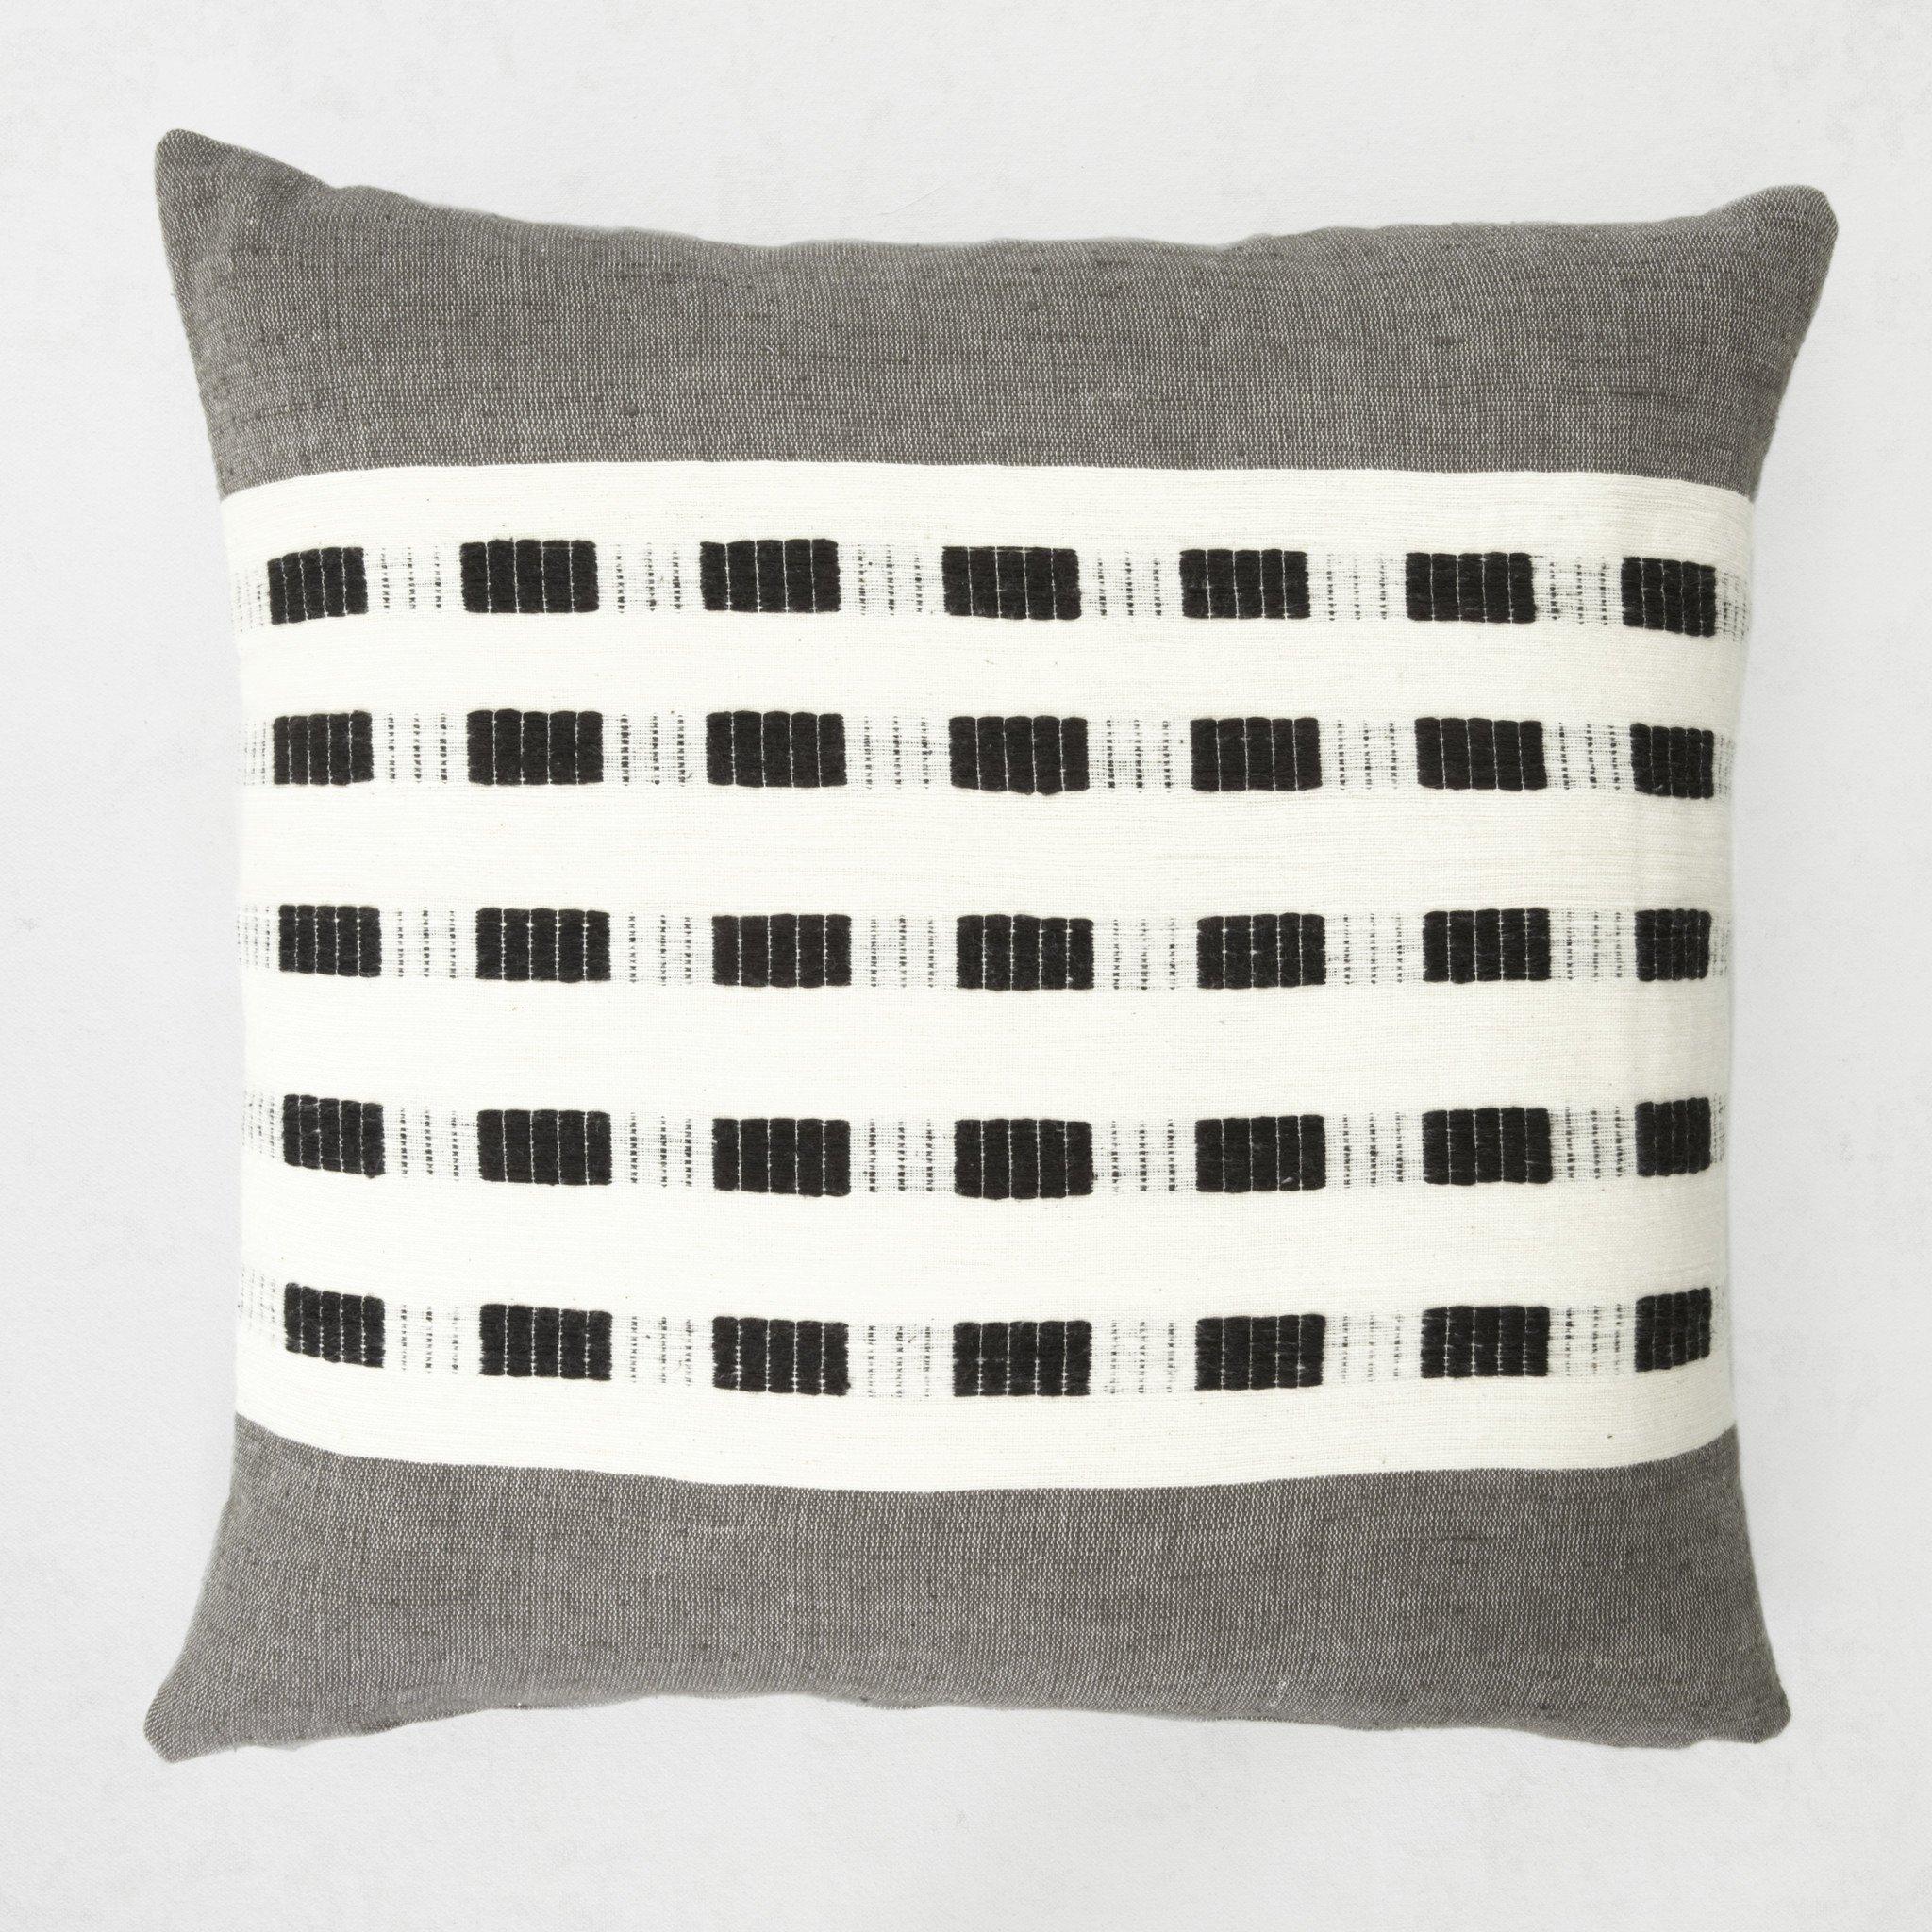 Handwoven Ethiopia Cotten Pillow